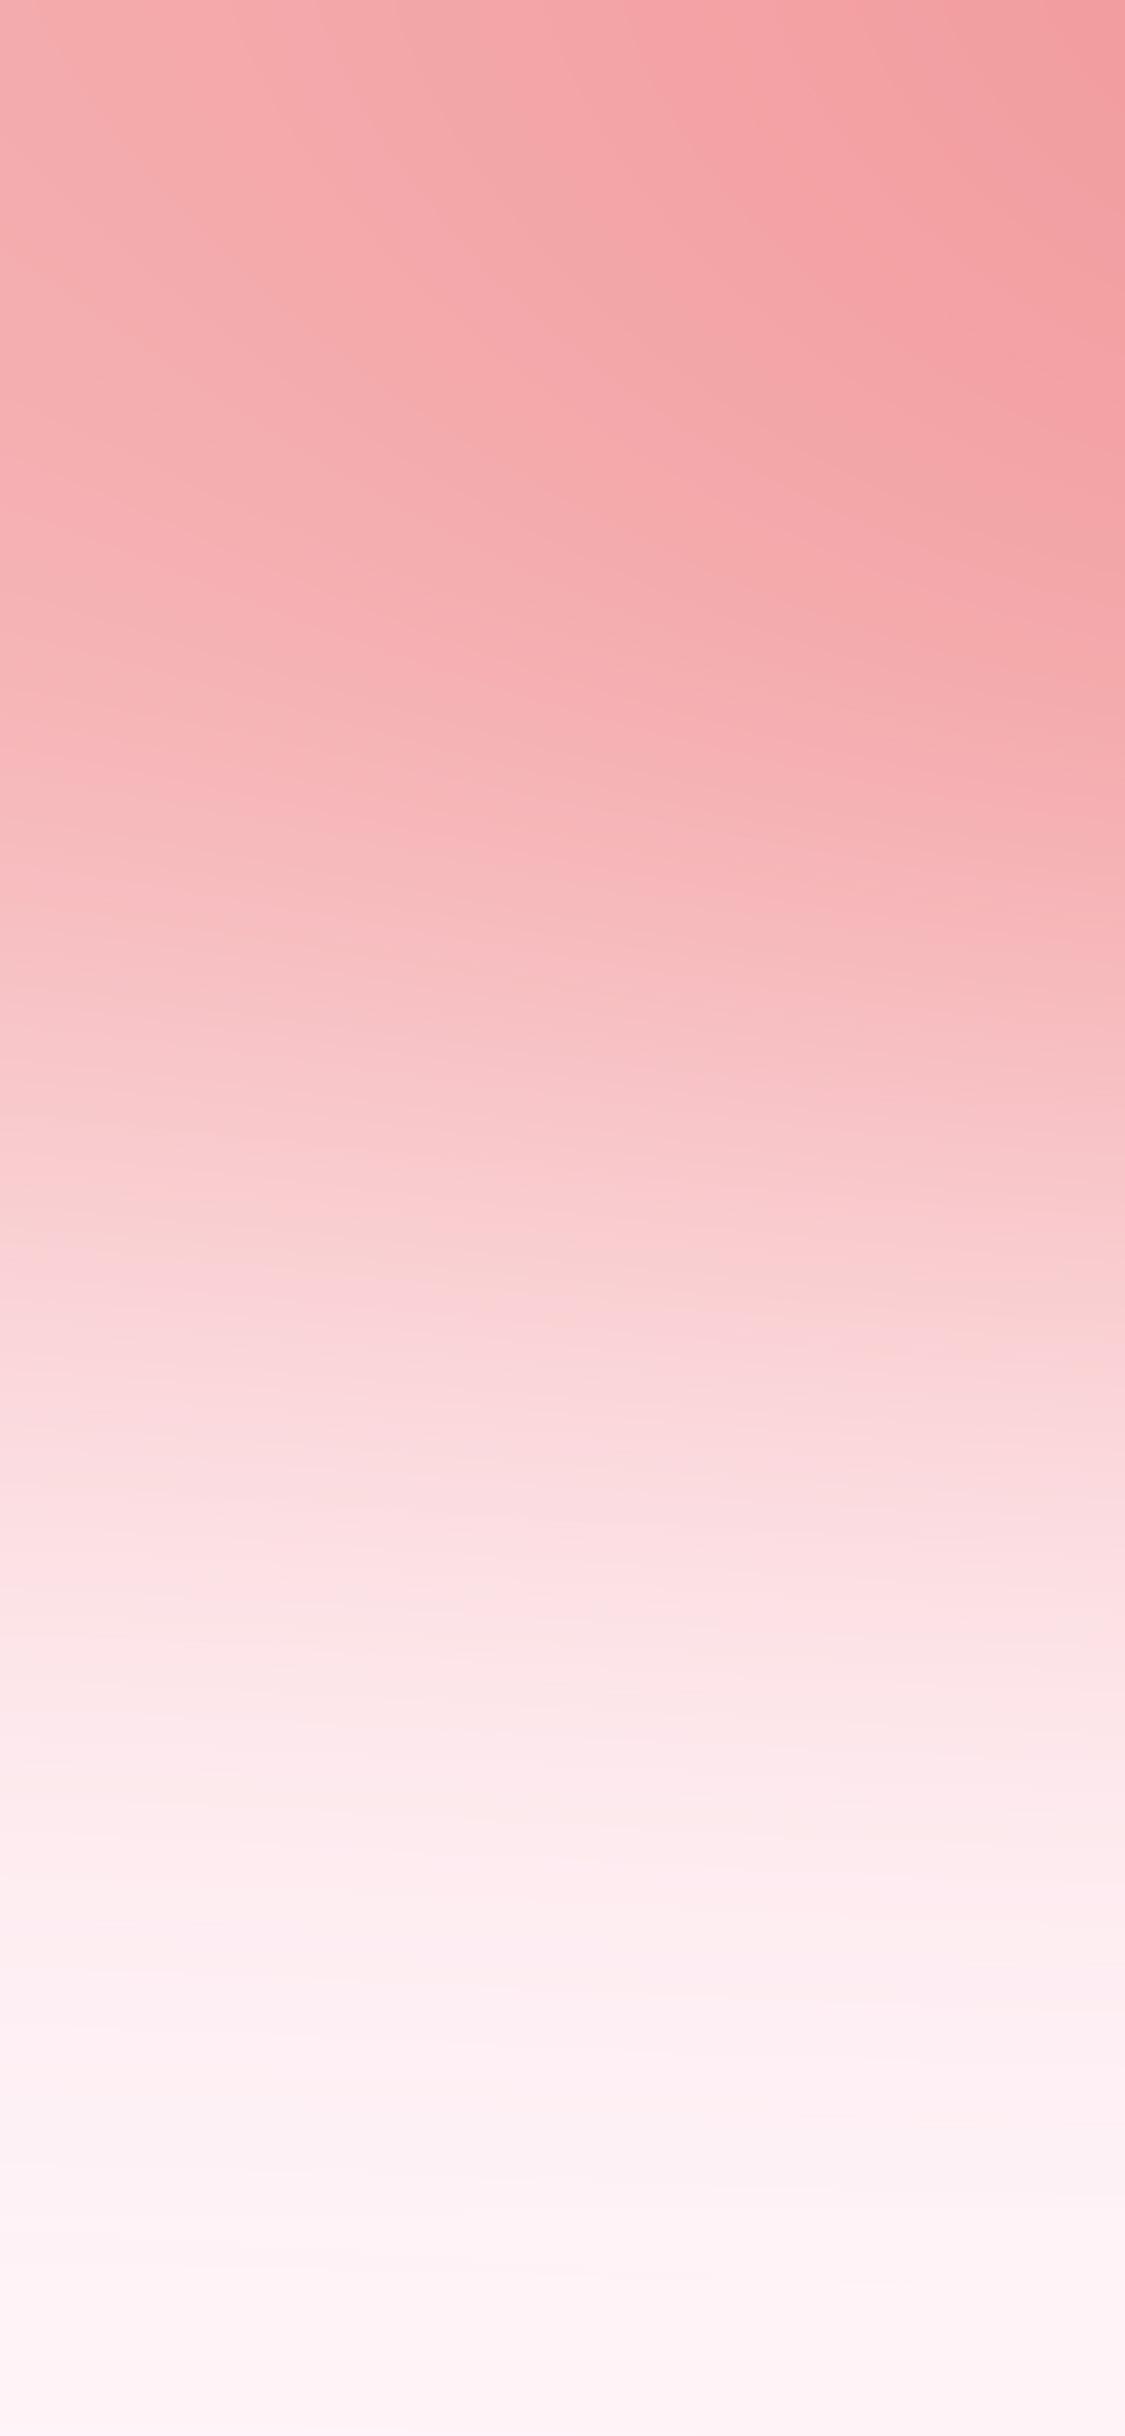 iPhonexpapers.com-Apple-iPhone-wallpaper-sn54-pink-floid-blur-gradation